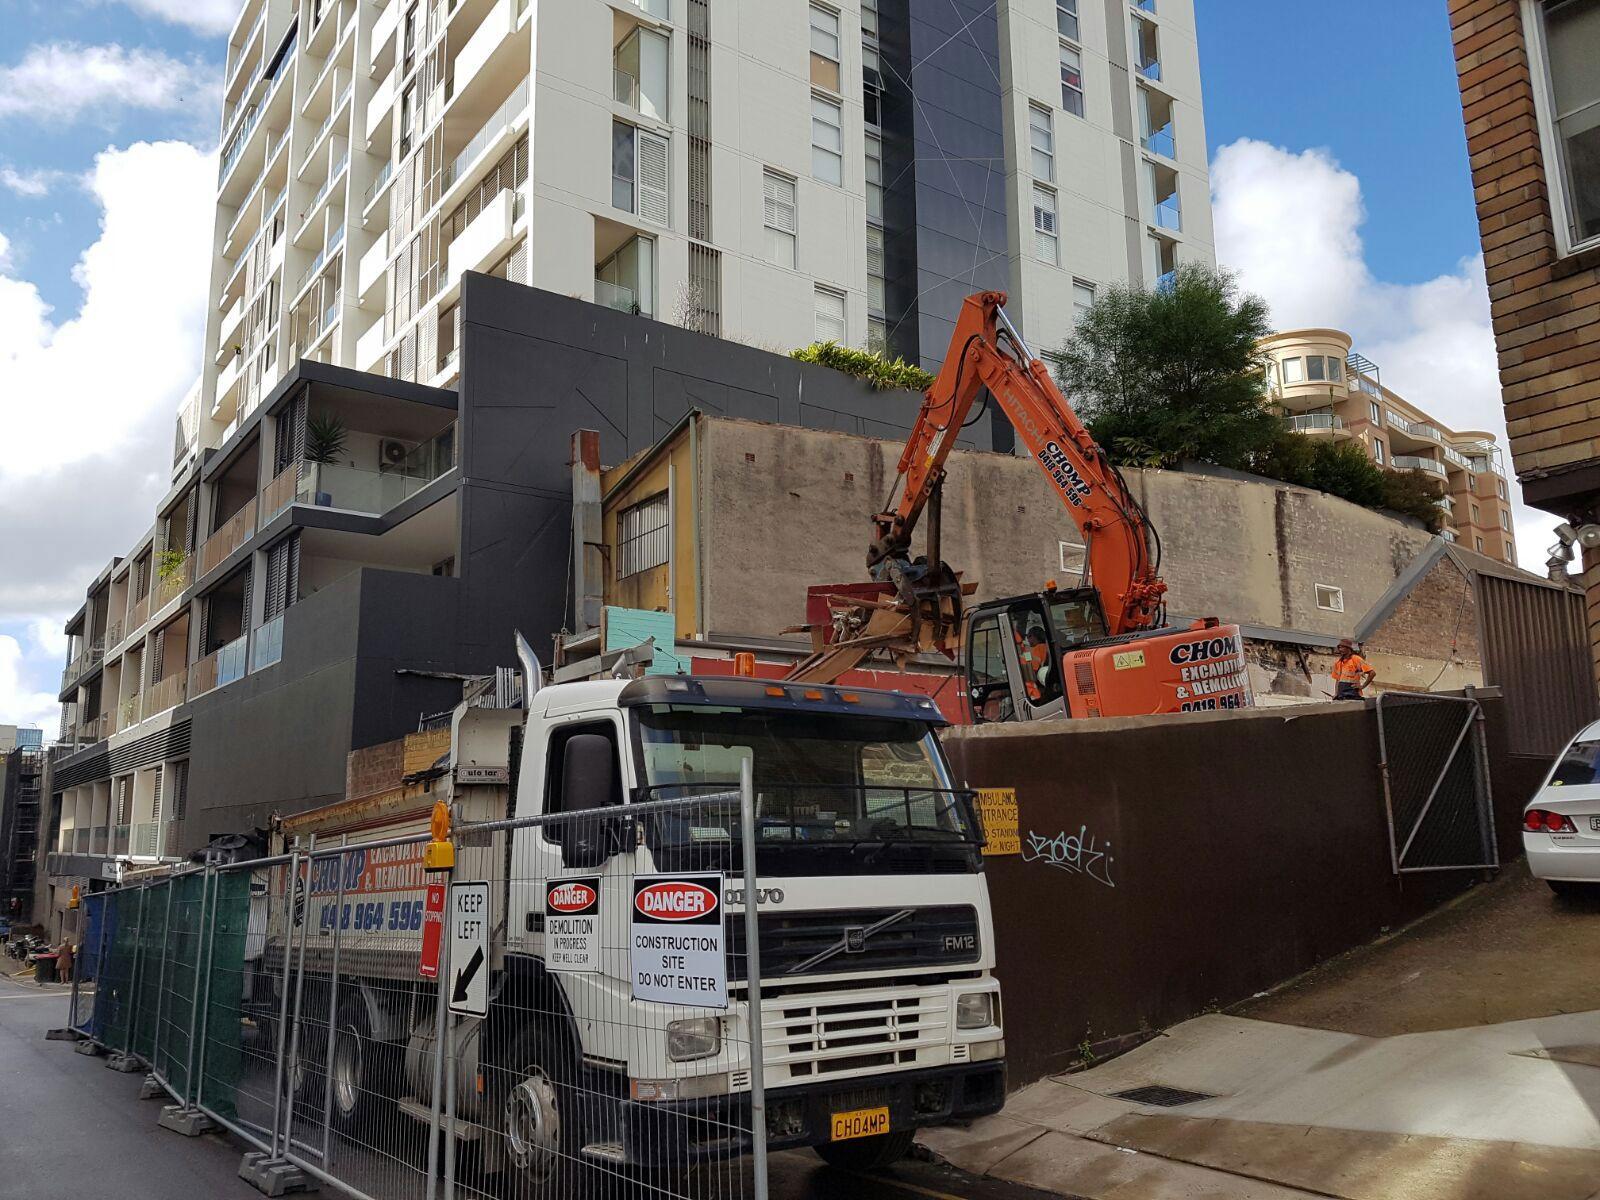 Company chomp excavation demolition demolition